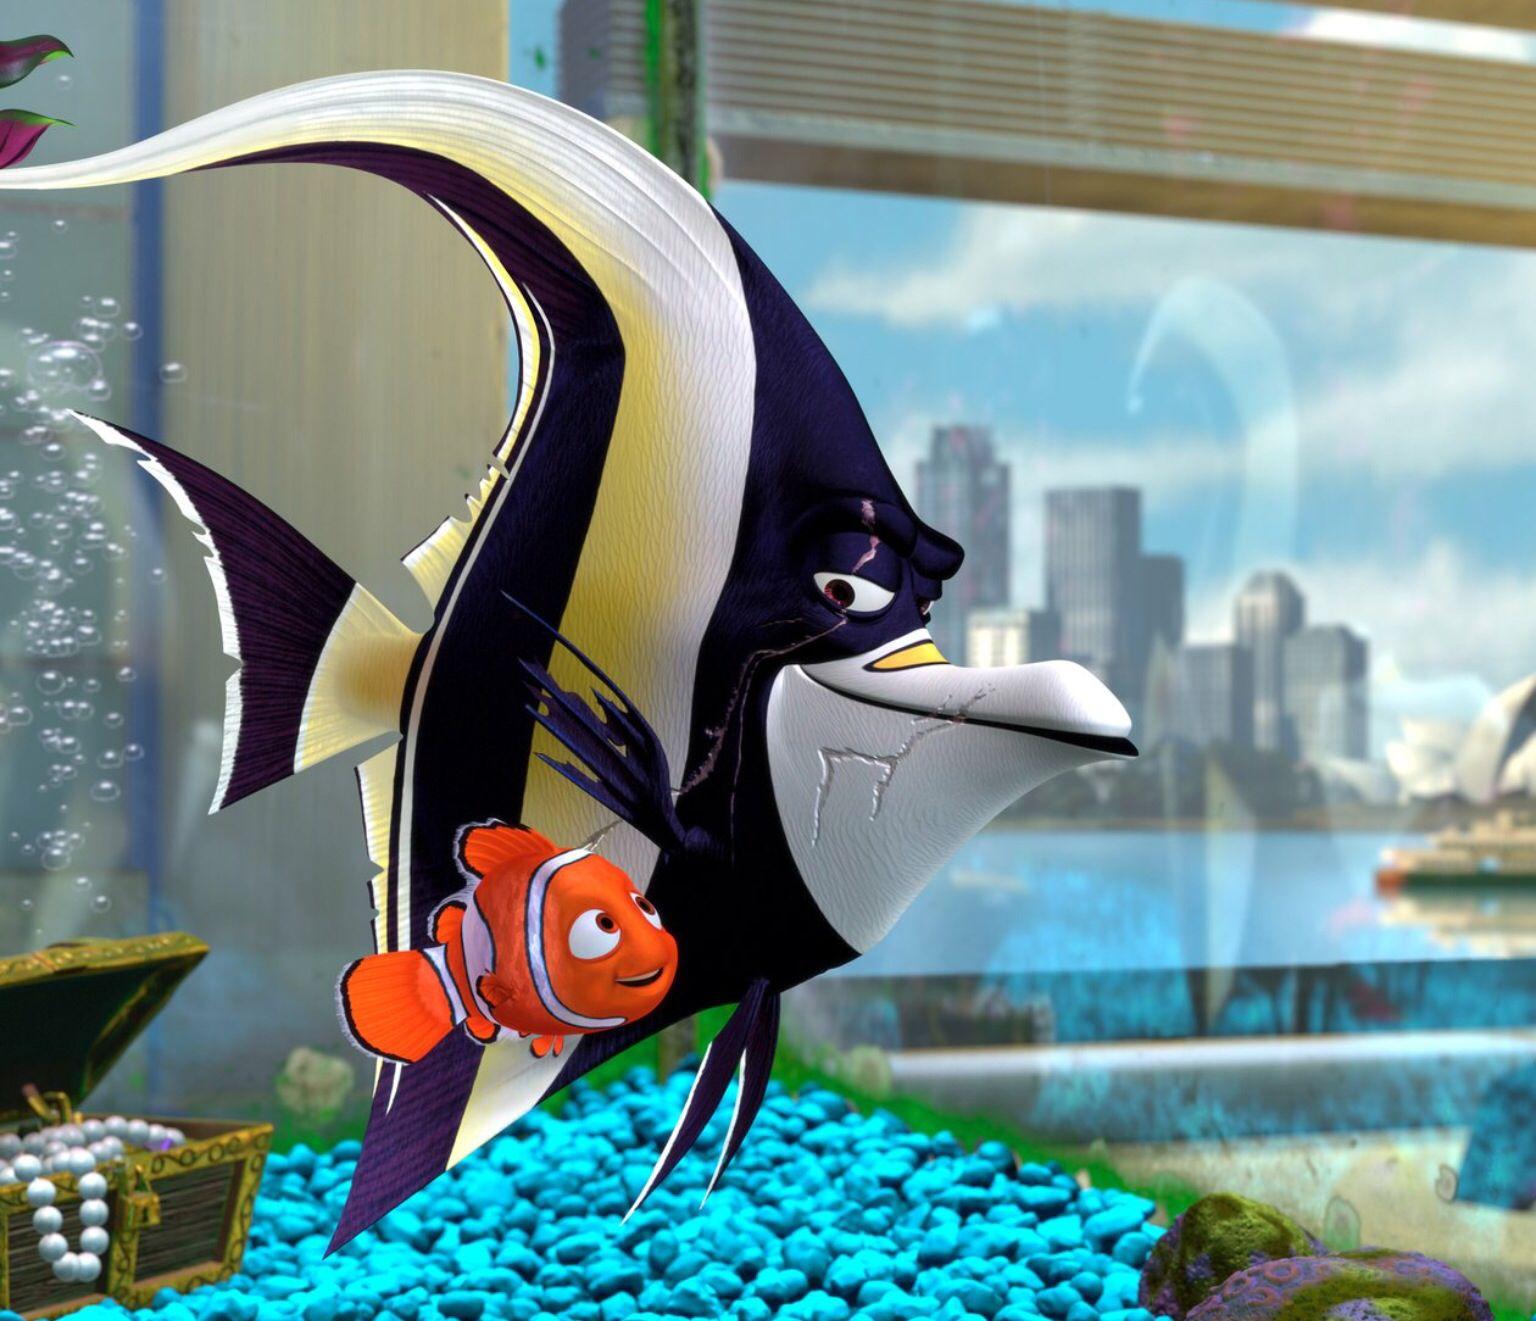 Gill's my fav | Finding nemo, Finding nemo fish  Walt Disney Pictures Presents A Pixar Animation Studios Film Finding Nemo